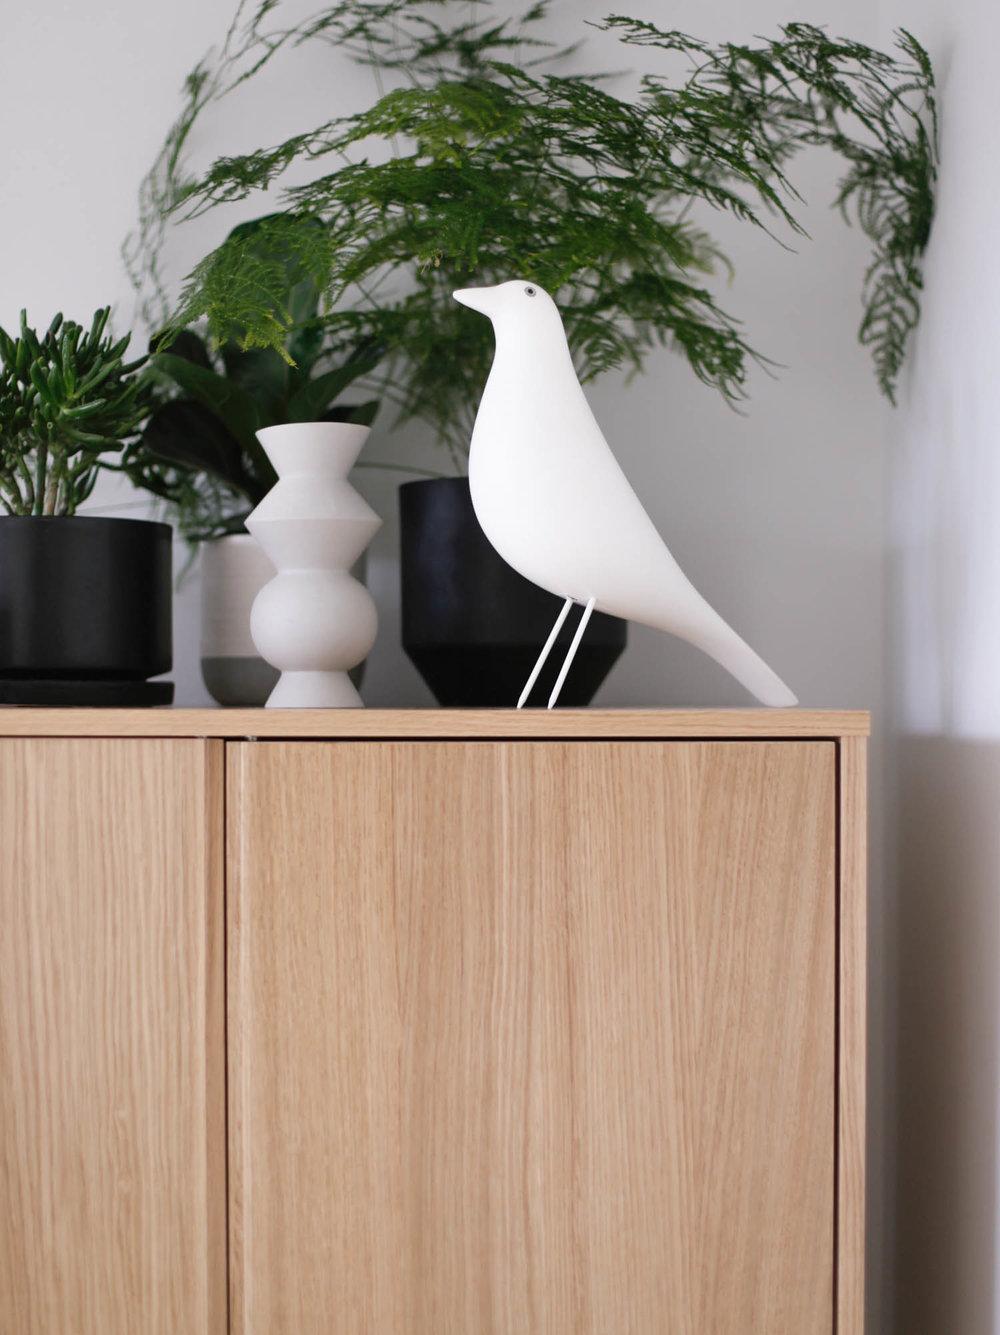 Plants and white Vitra house bird